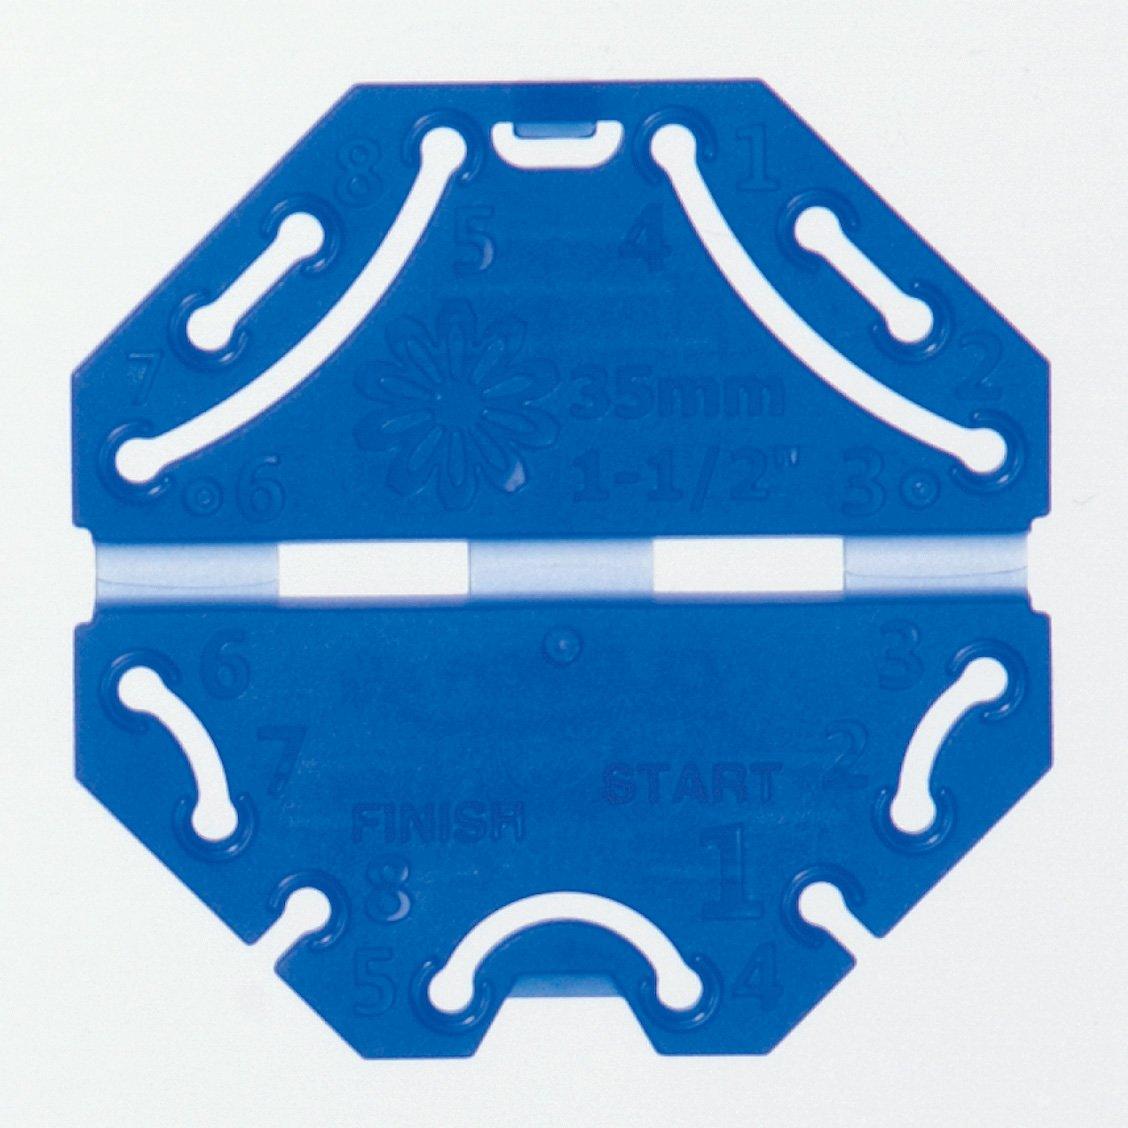 X-Small Clover 8491 Kanzashi Flower Maker Pointed Petal Quilt Pattern